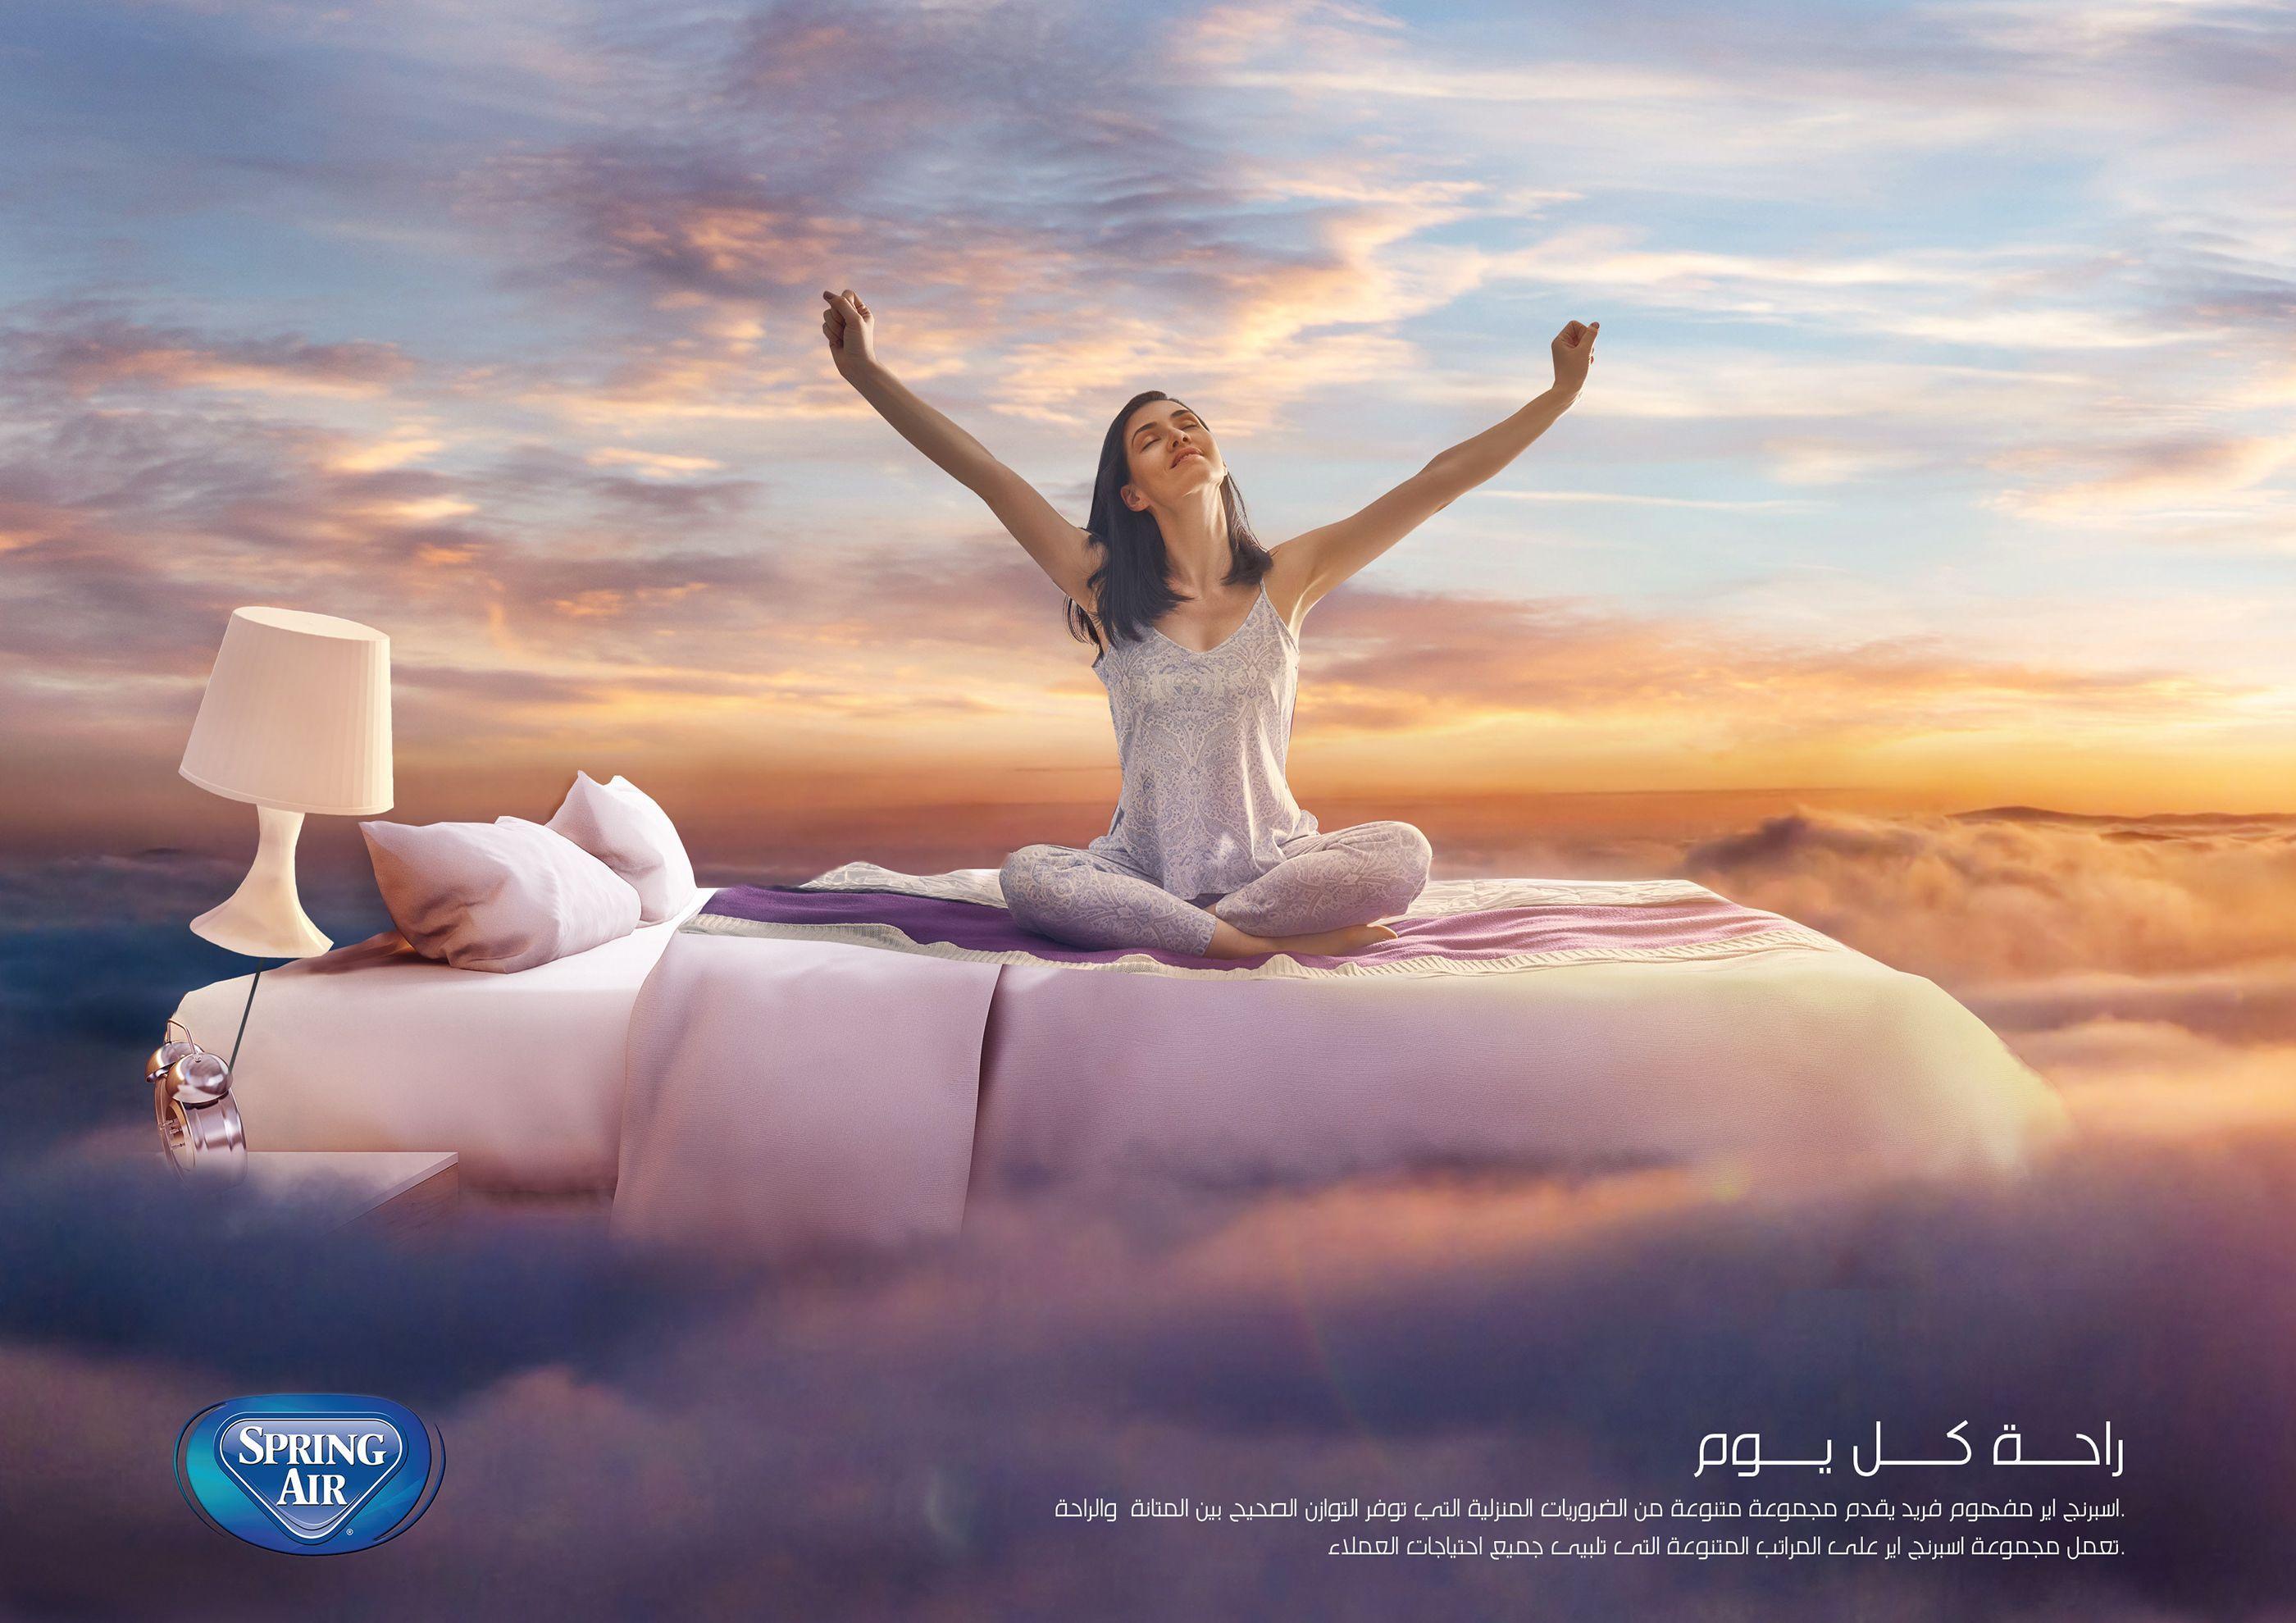 Spring Air mattress on Behance springairmattress Spring